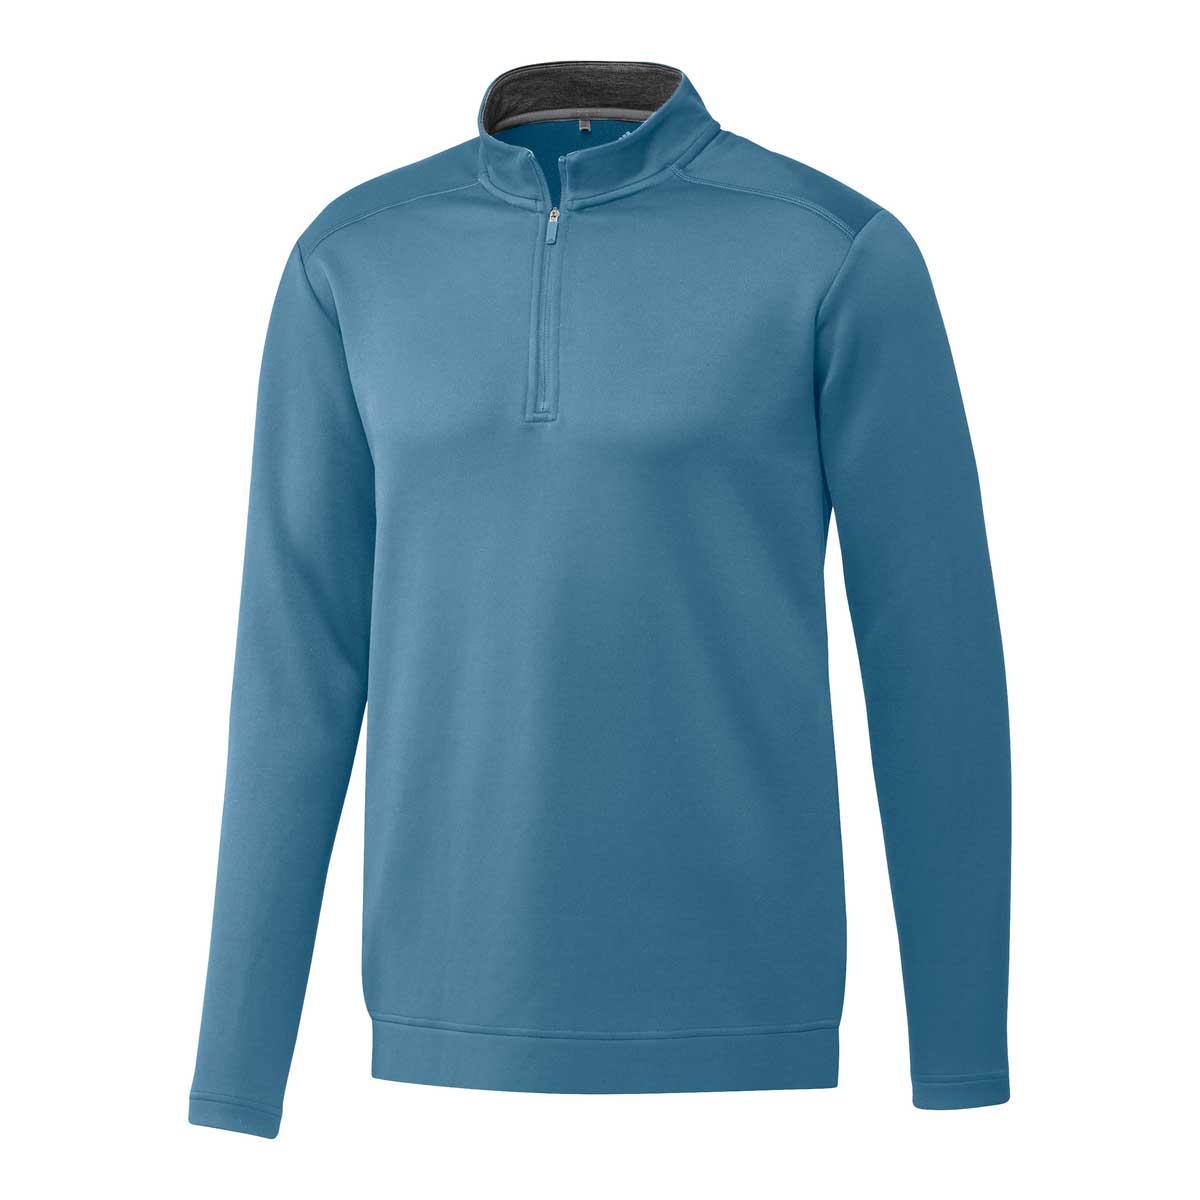 Adidas Men's Club 1/4 Zip Hazy Blue Pullover